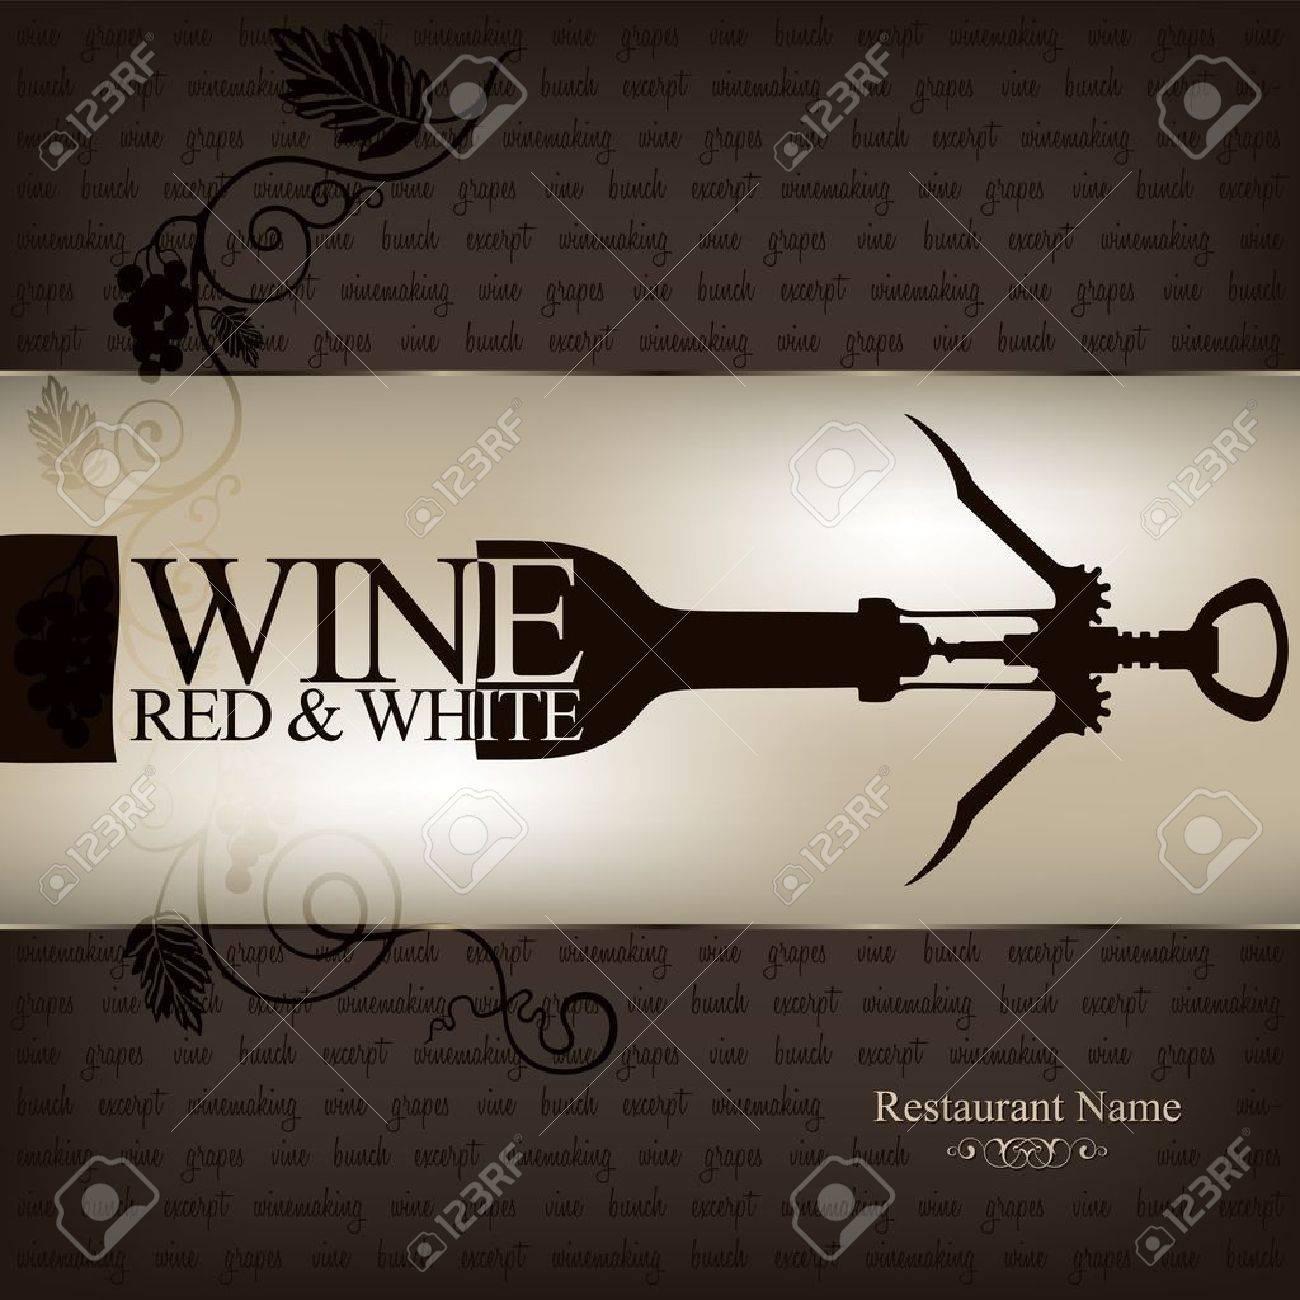 Wine list design Stock Vector - 10940333